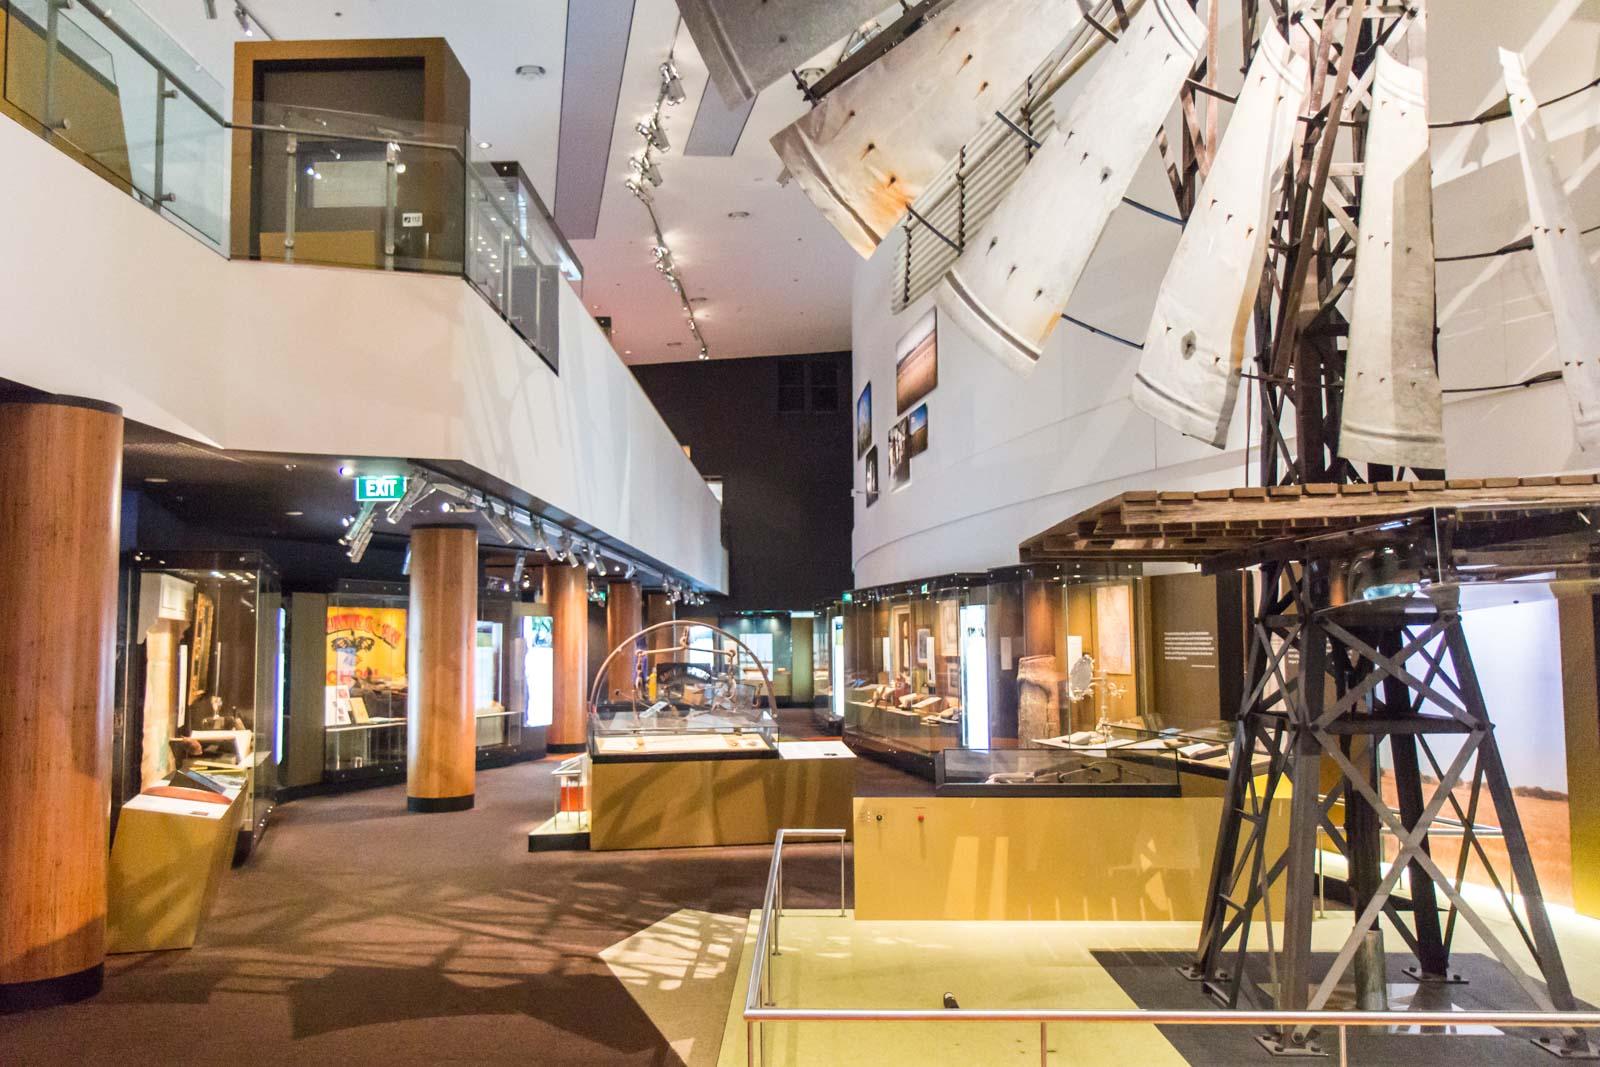 National Museum, Canberra, Australia